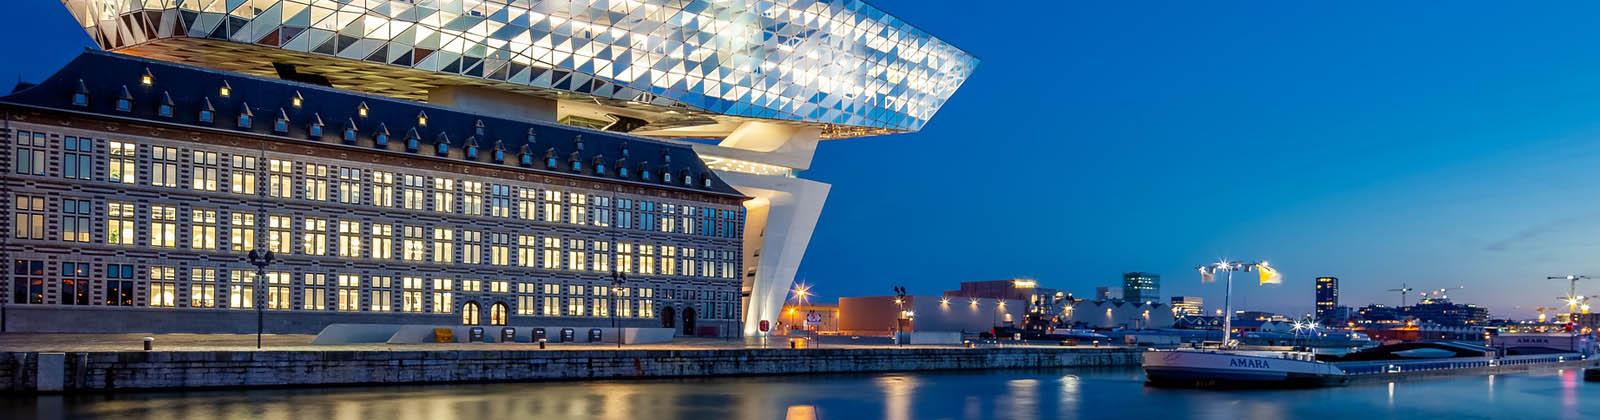 DMC-Antwerp-tour-operator